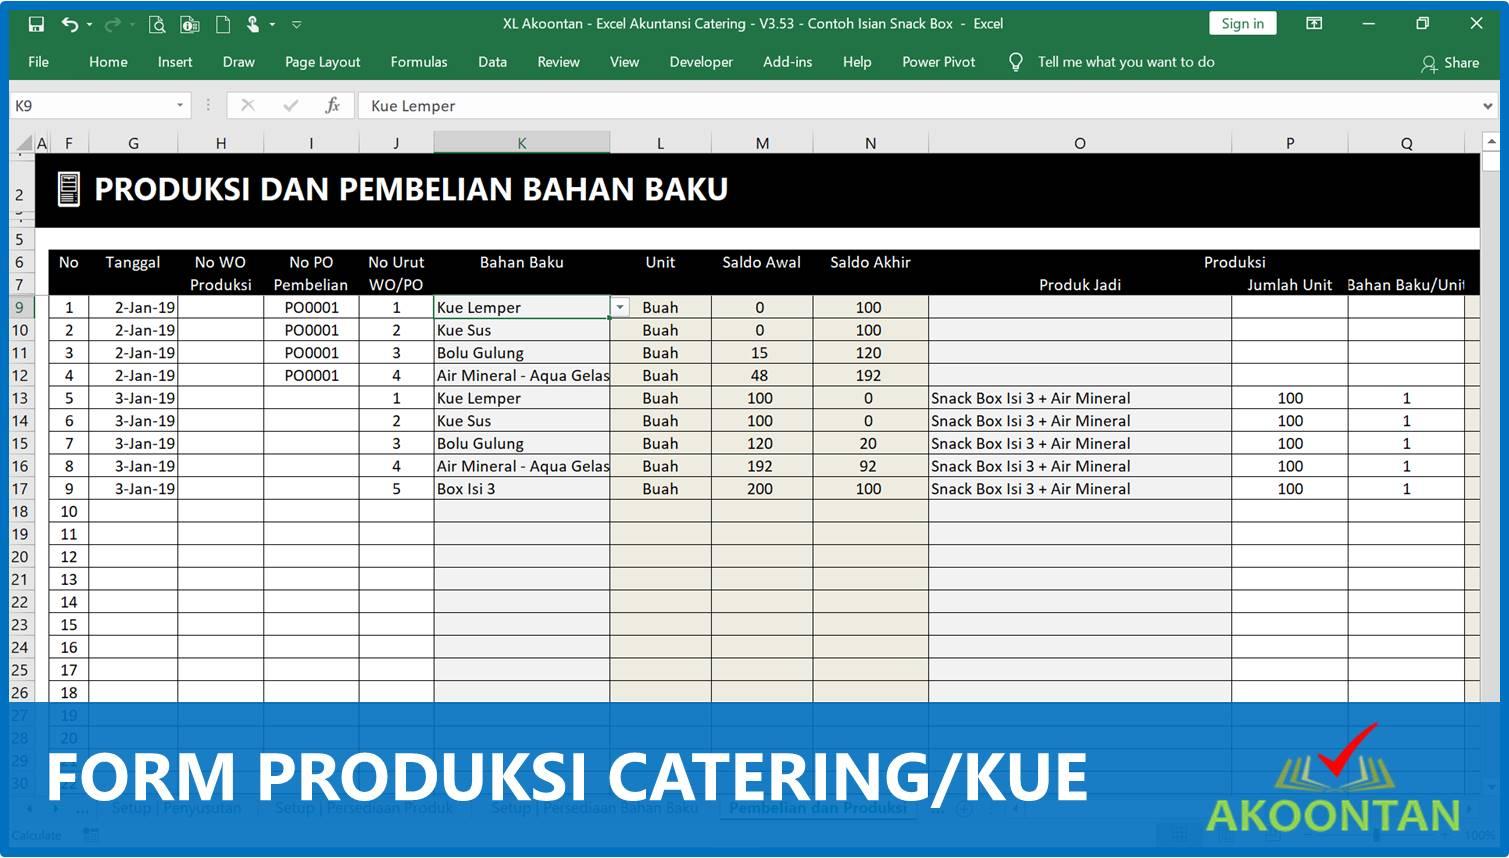 Form Produksi Usaha Catering - Akuntansi-ID